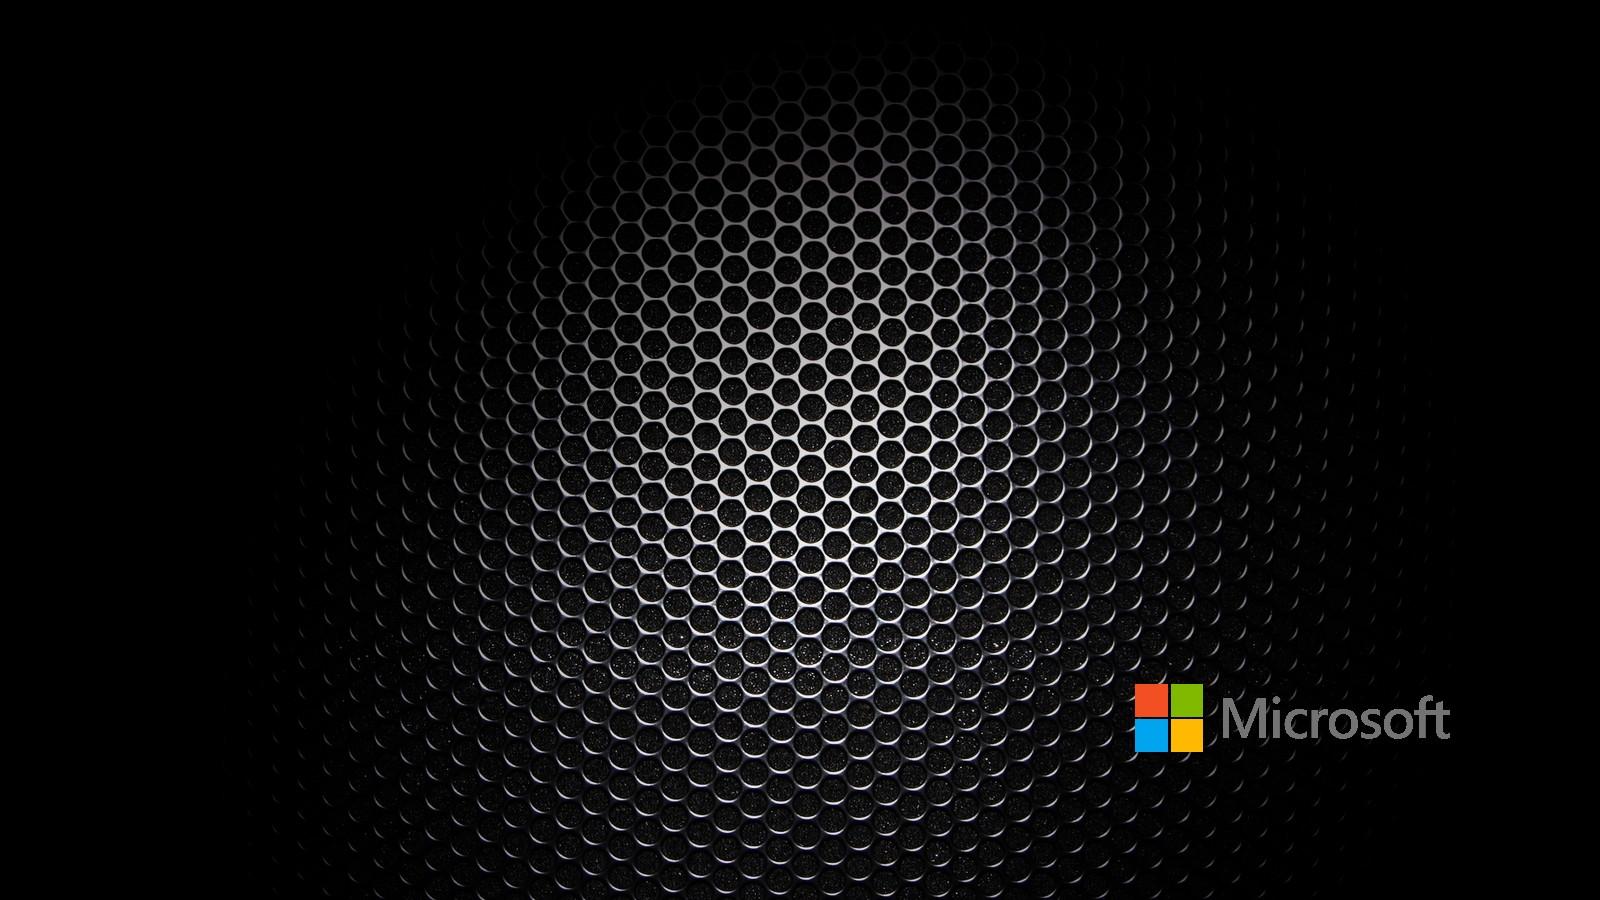 Hd Car Wallpapers Microsoft Wallpaper 04 1600x900